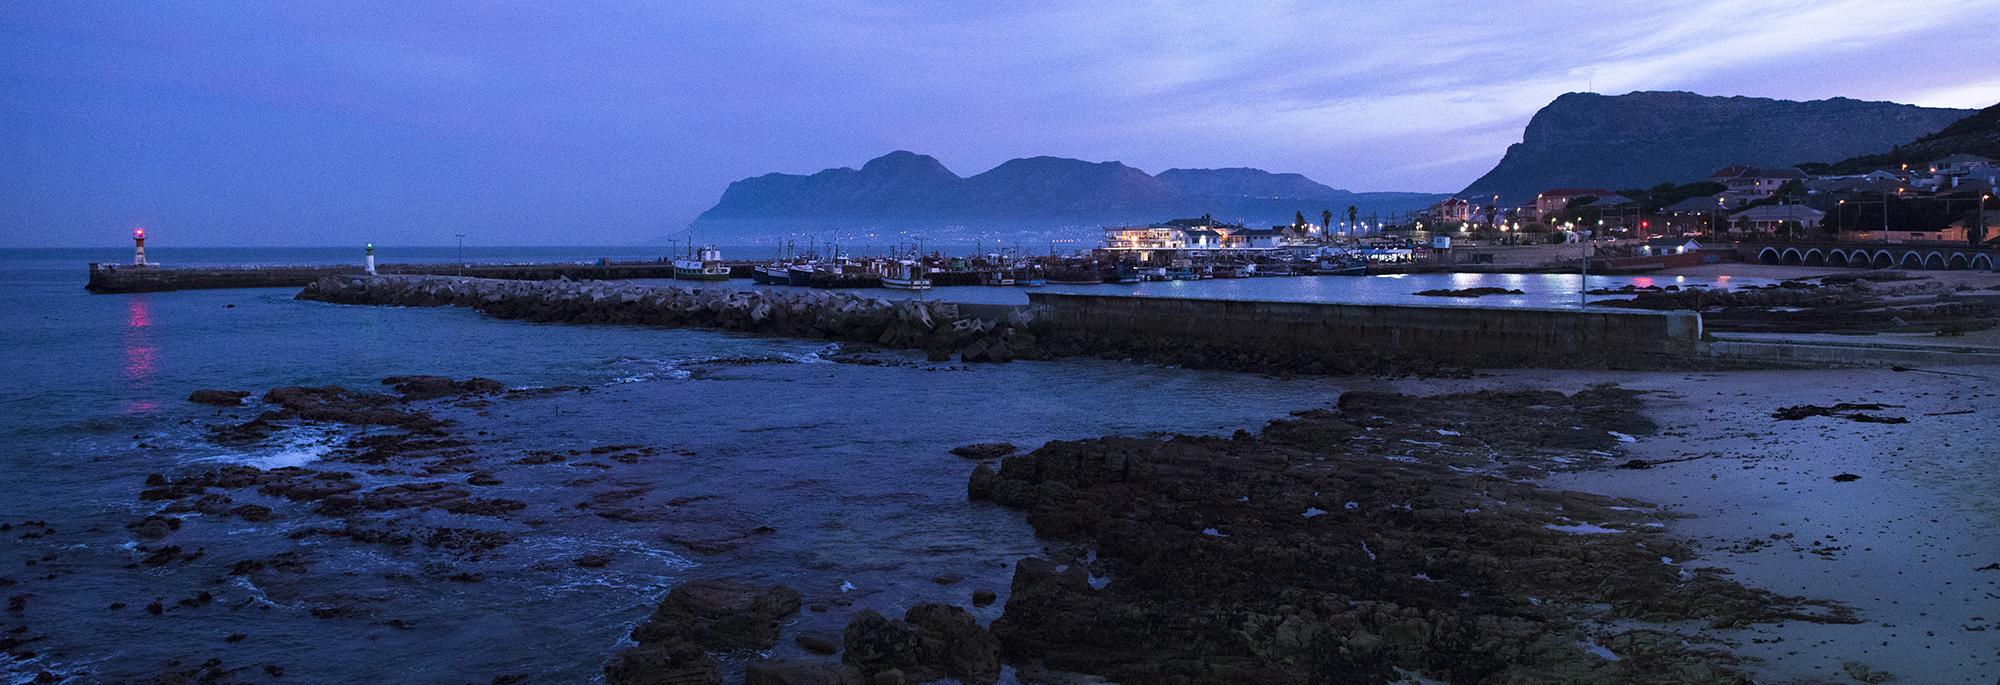 SouthAfrica-8967.jpg